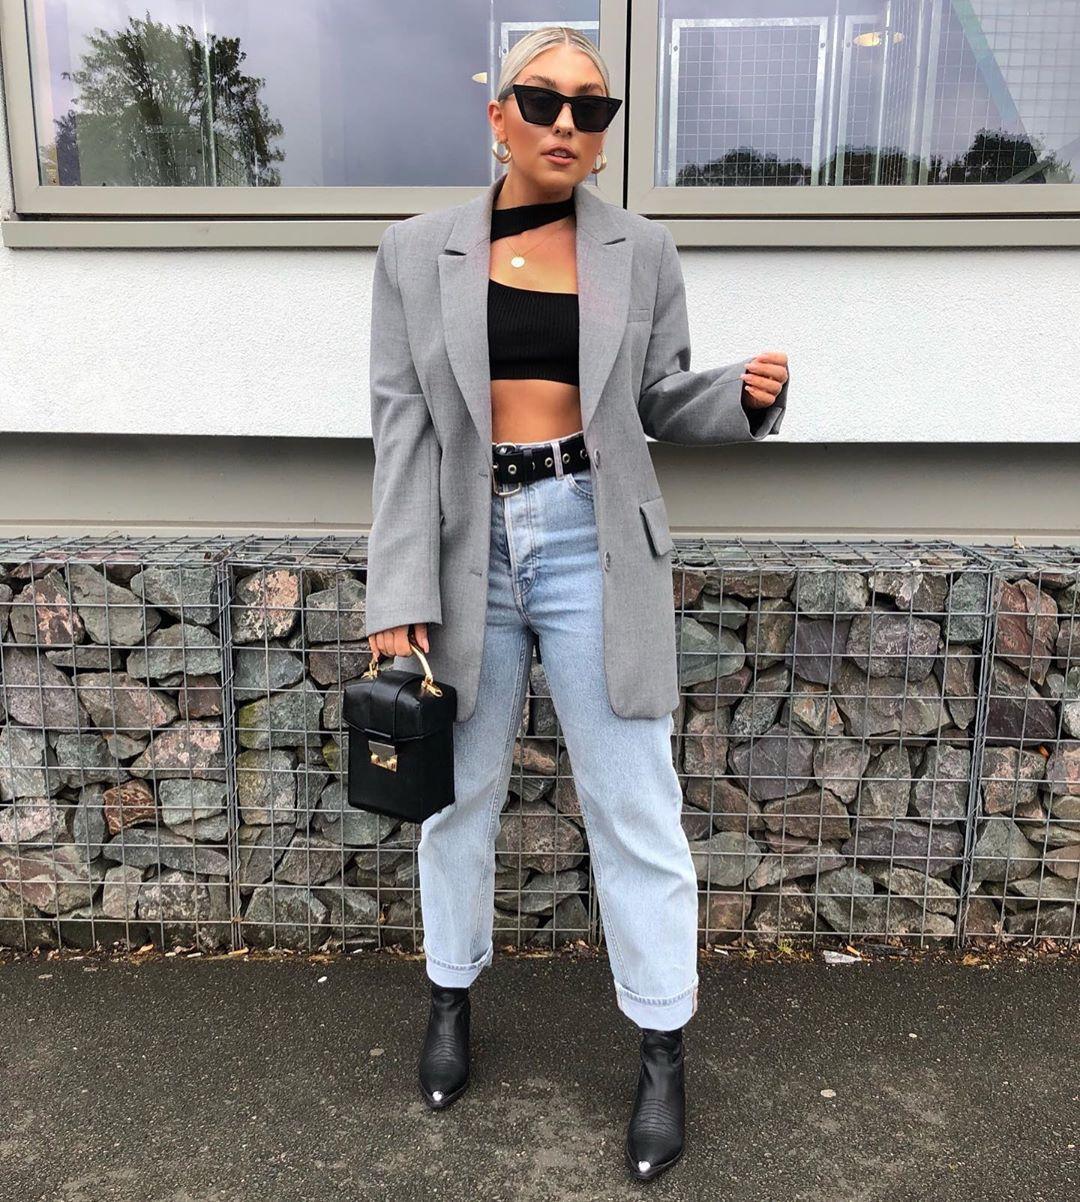 top crop tops black top black boots grey blazer high waisted jeans mom jeans black bag handbag